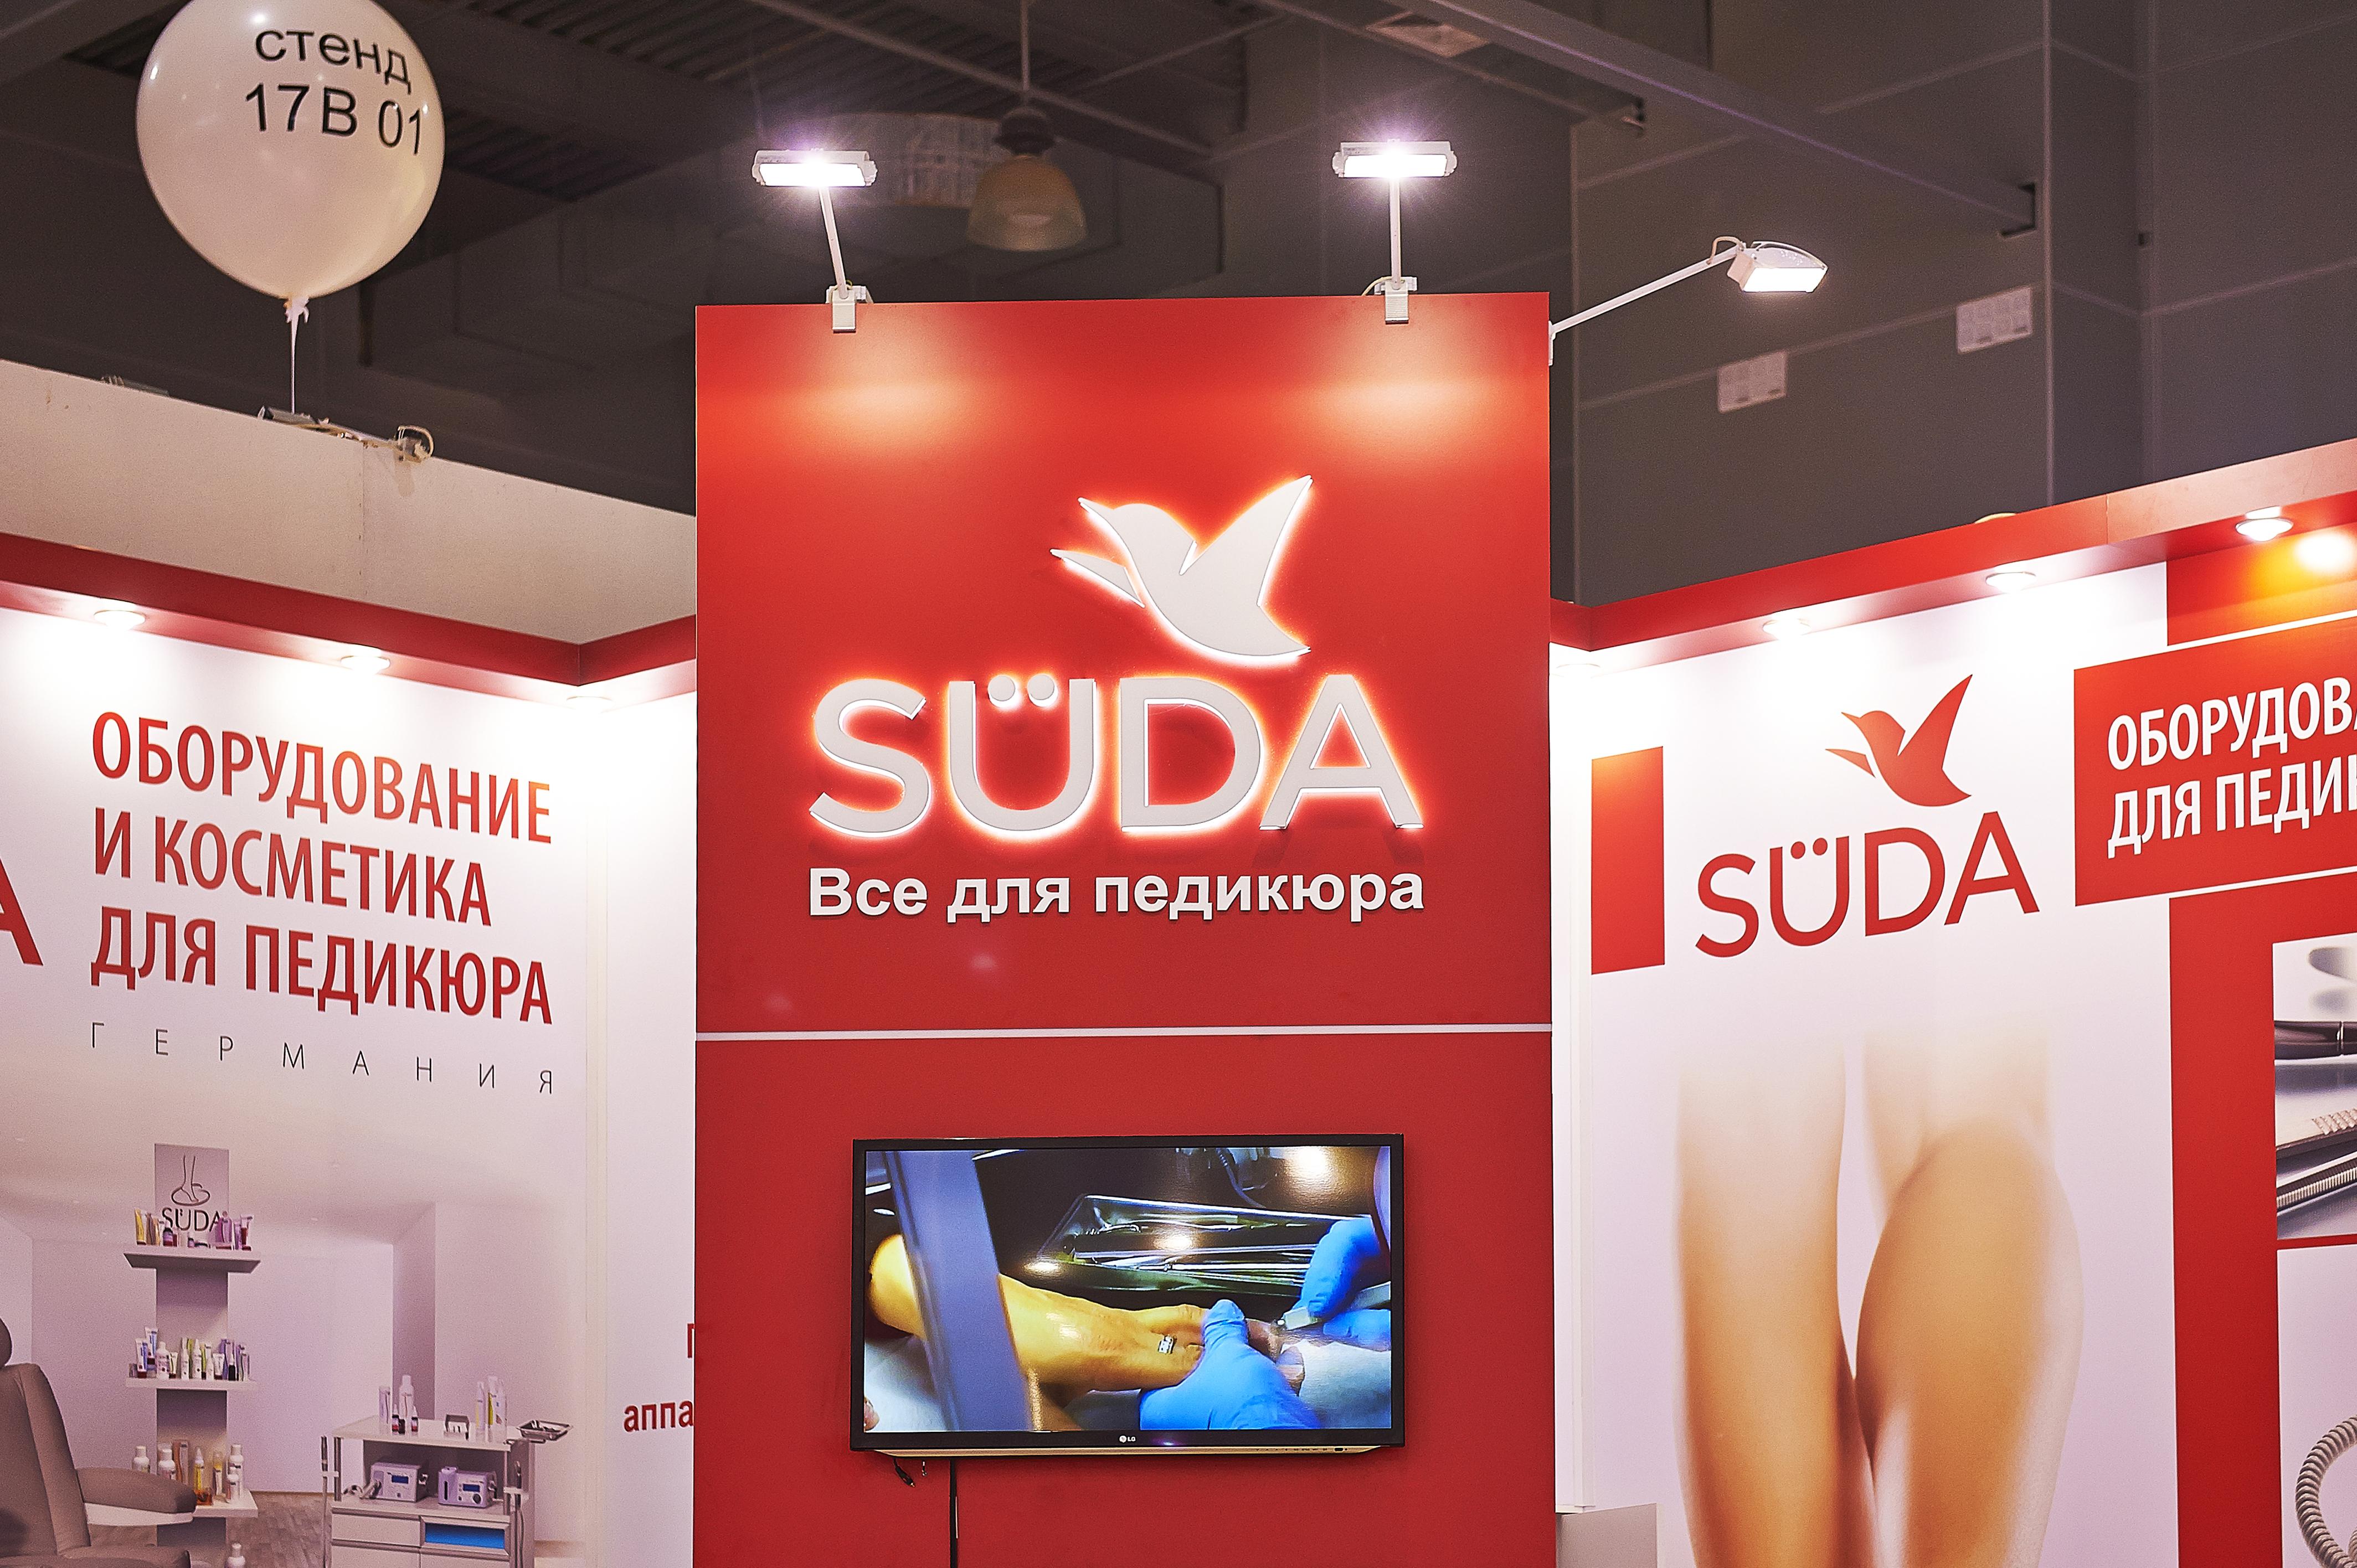 Suda_300dpi_12